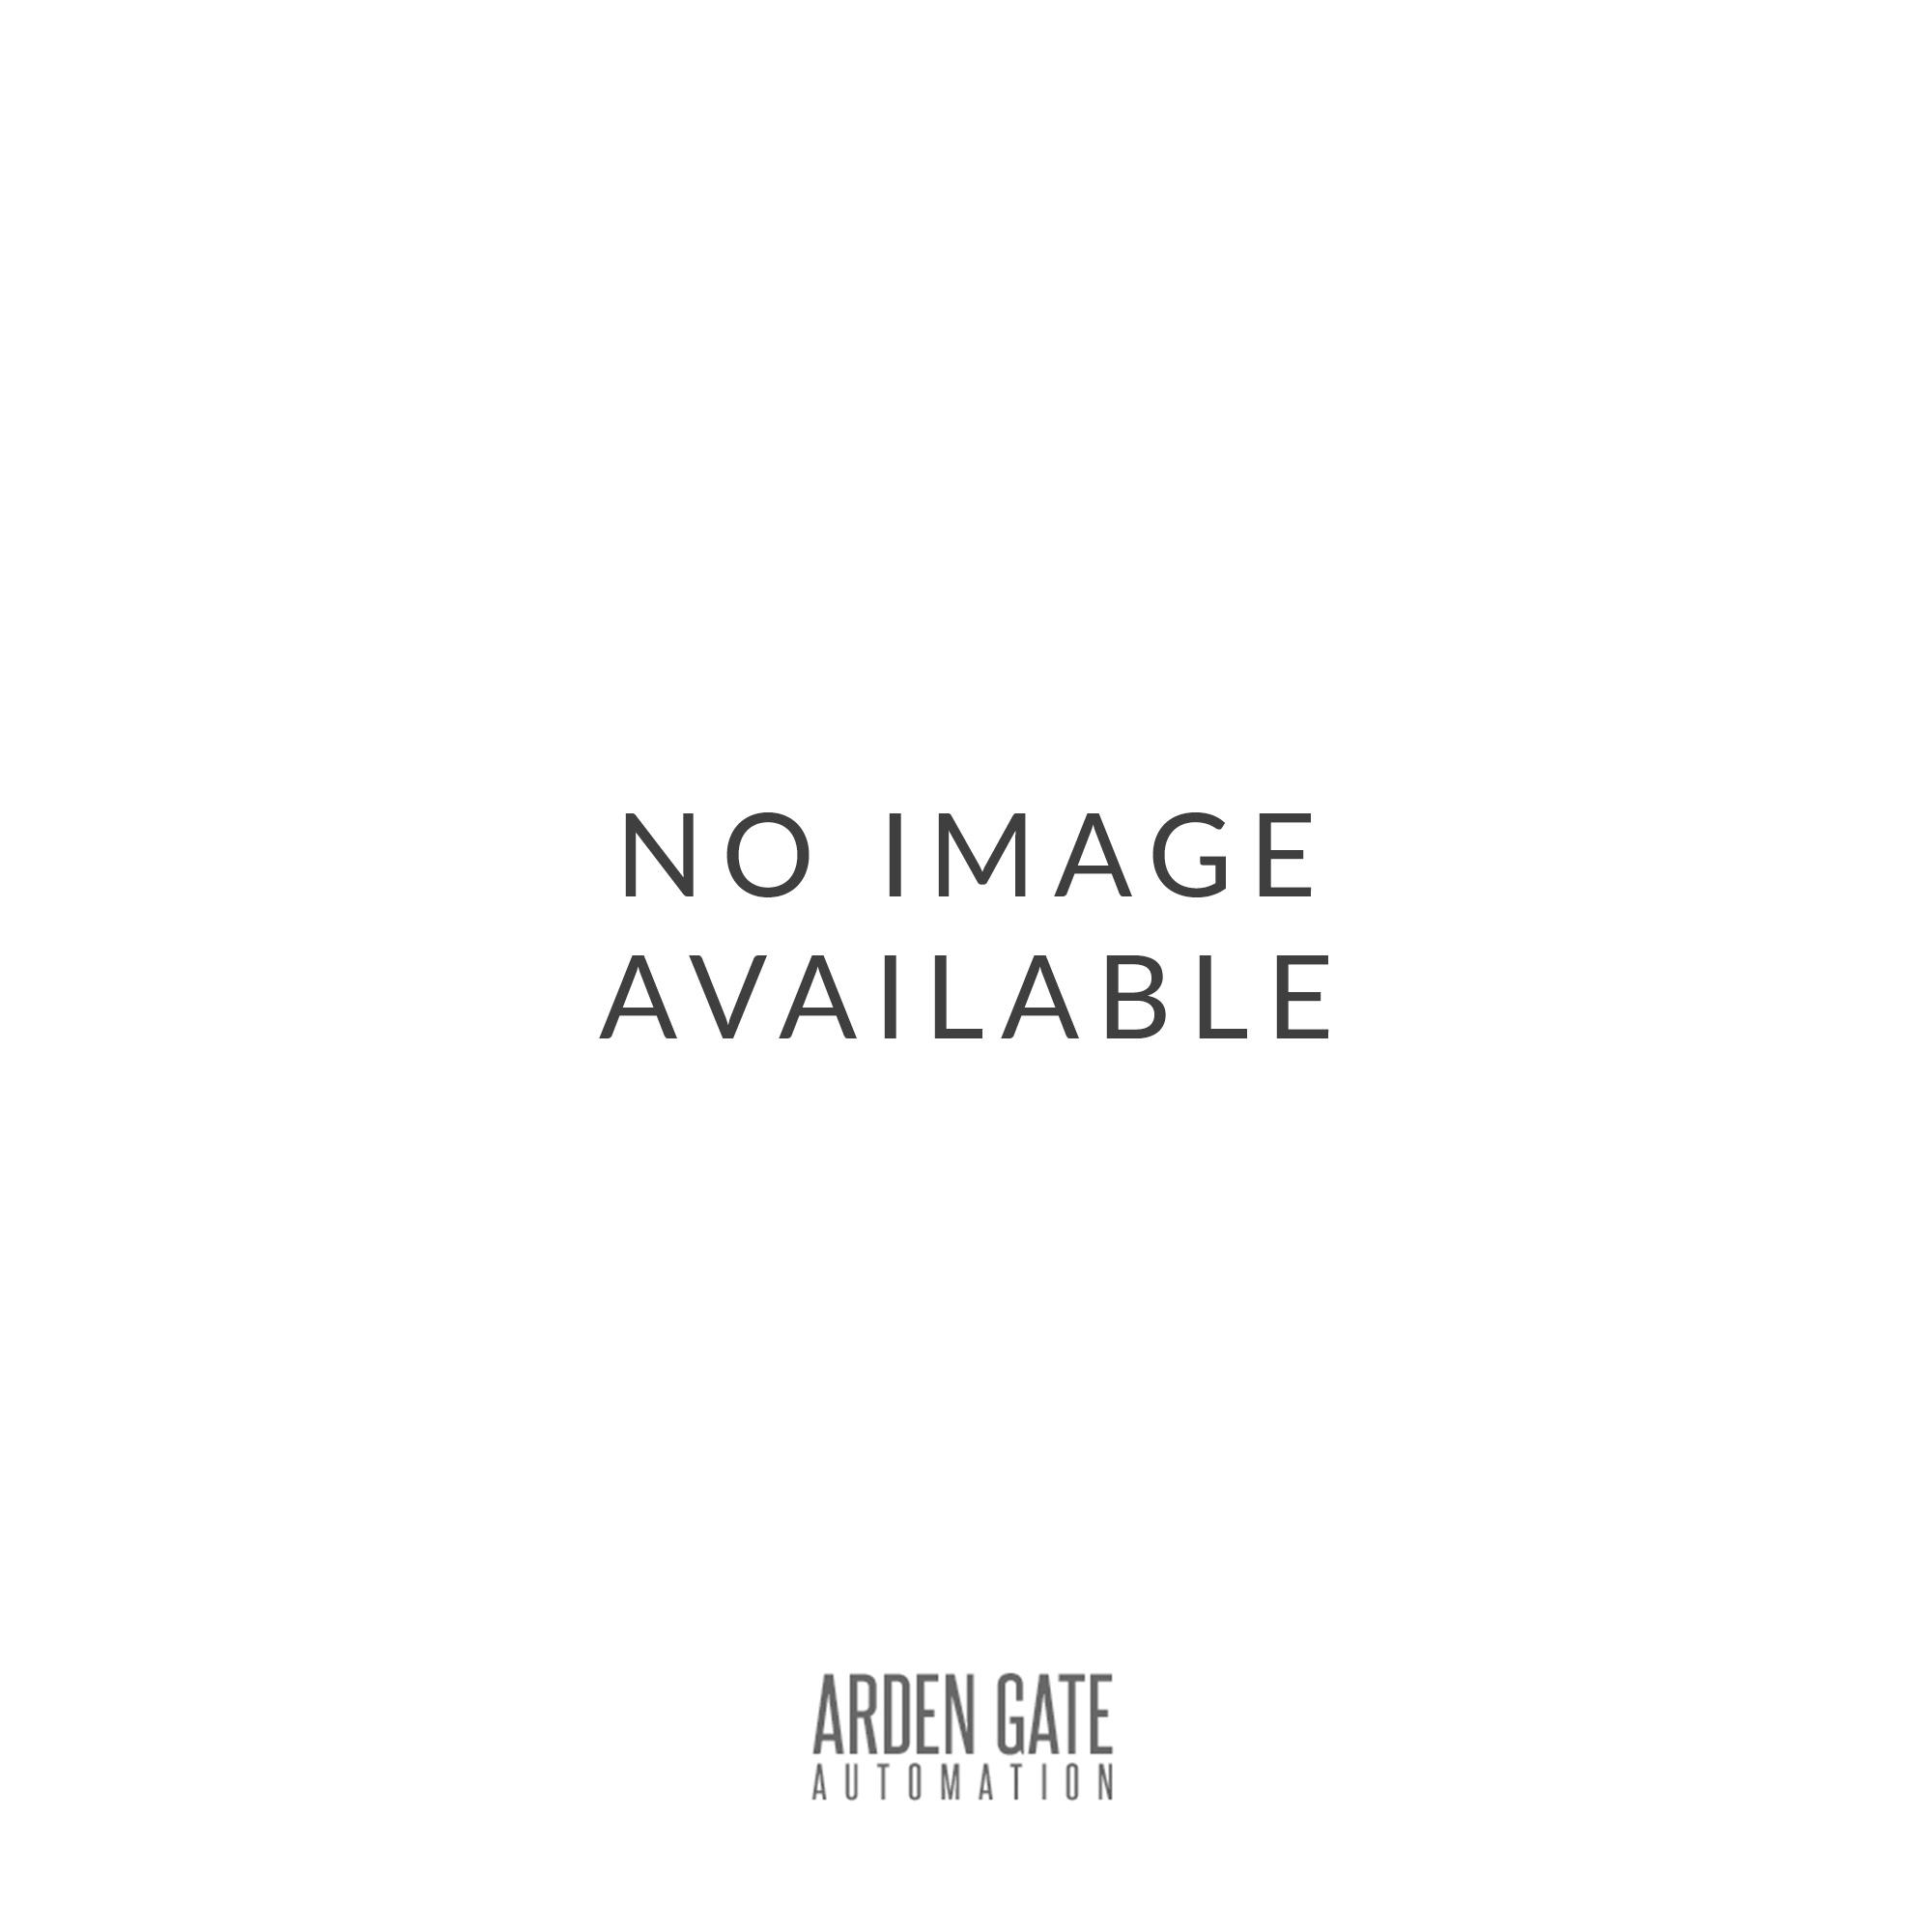 CAME U4610 overhead and sectional garage door kit